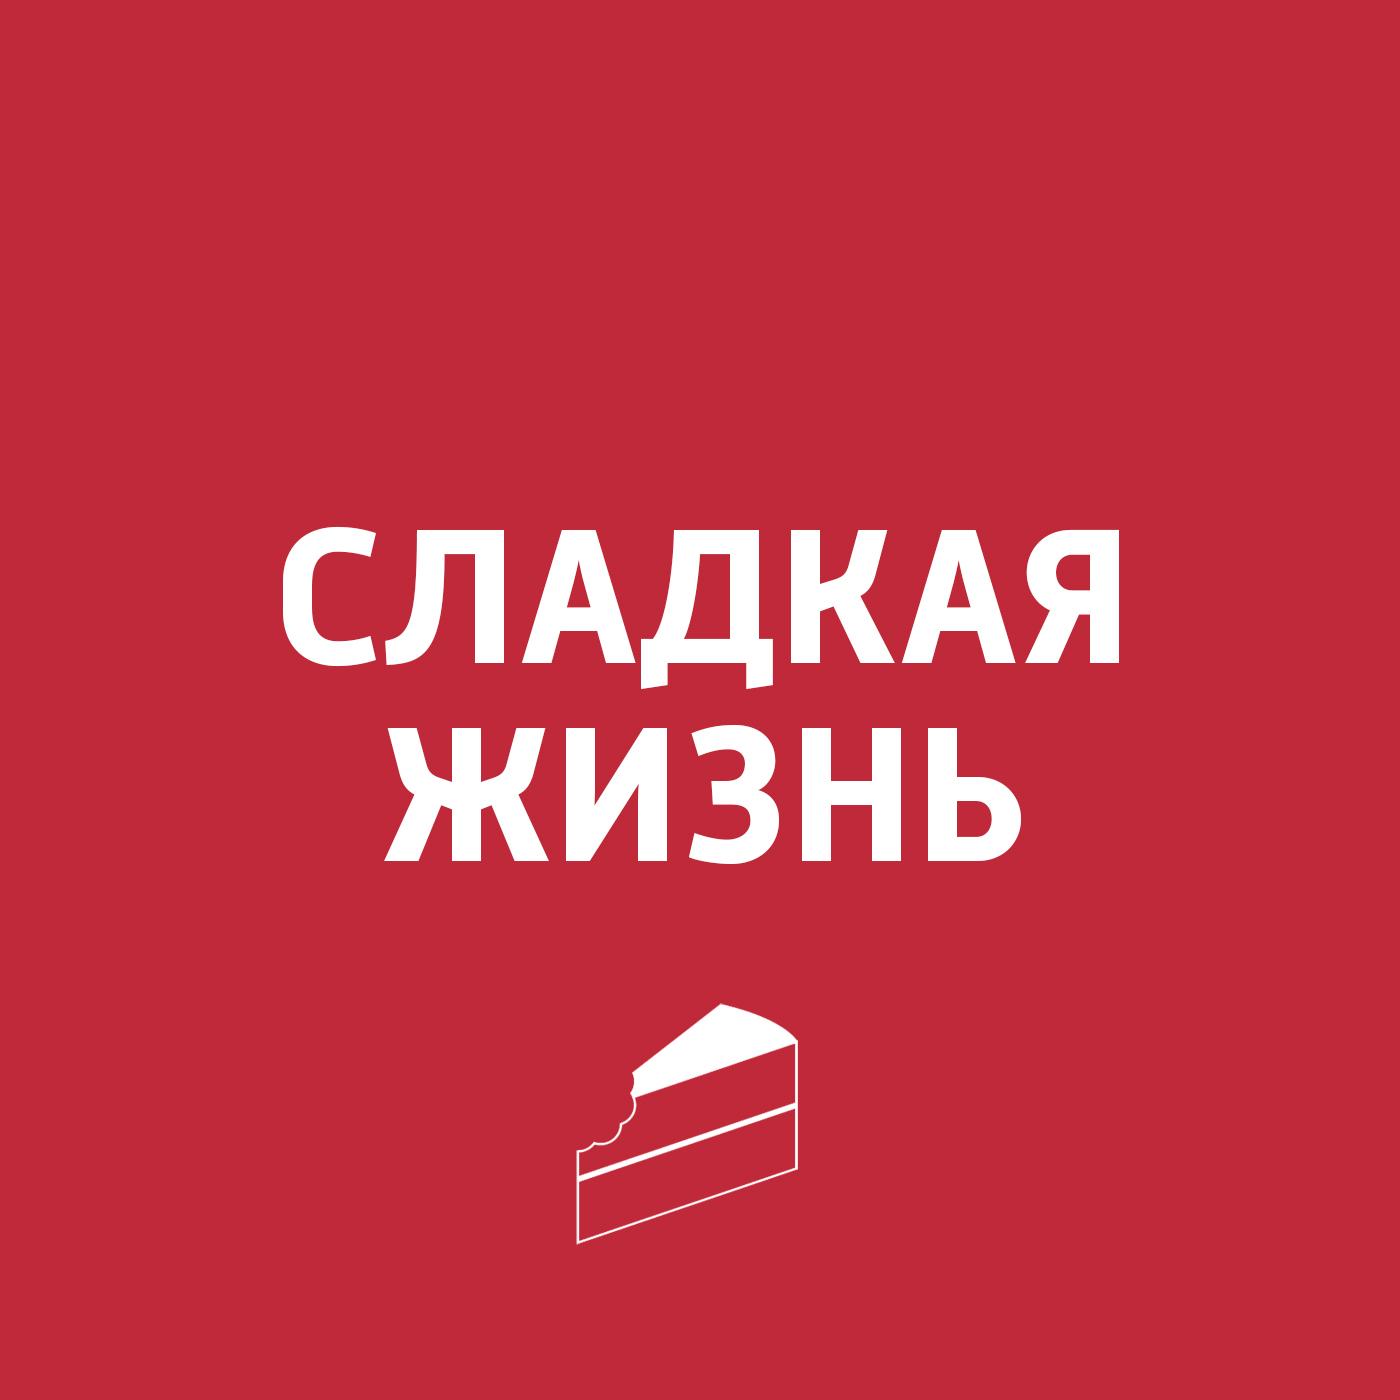 Картаев Павел Ватрушка